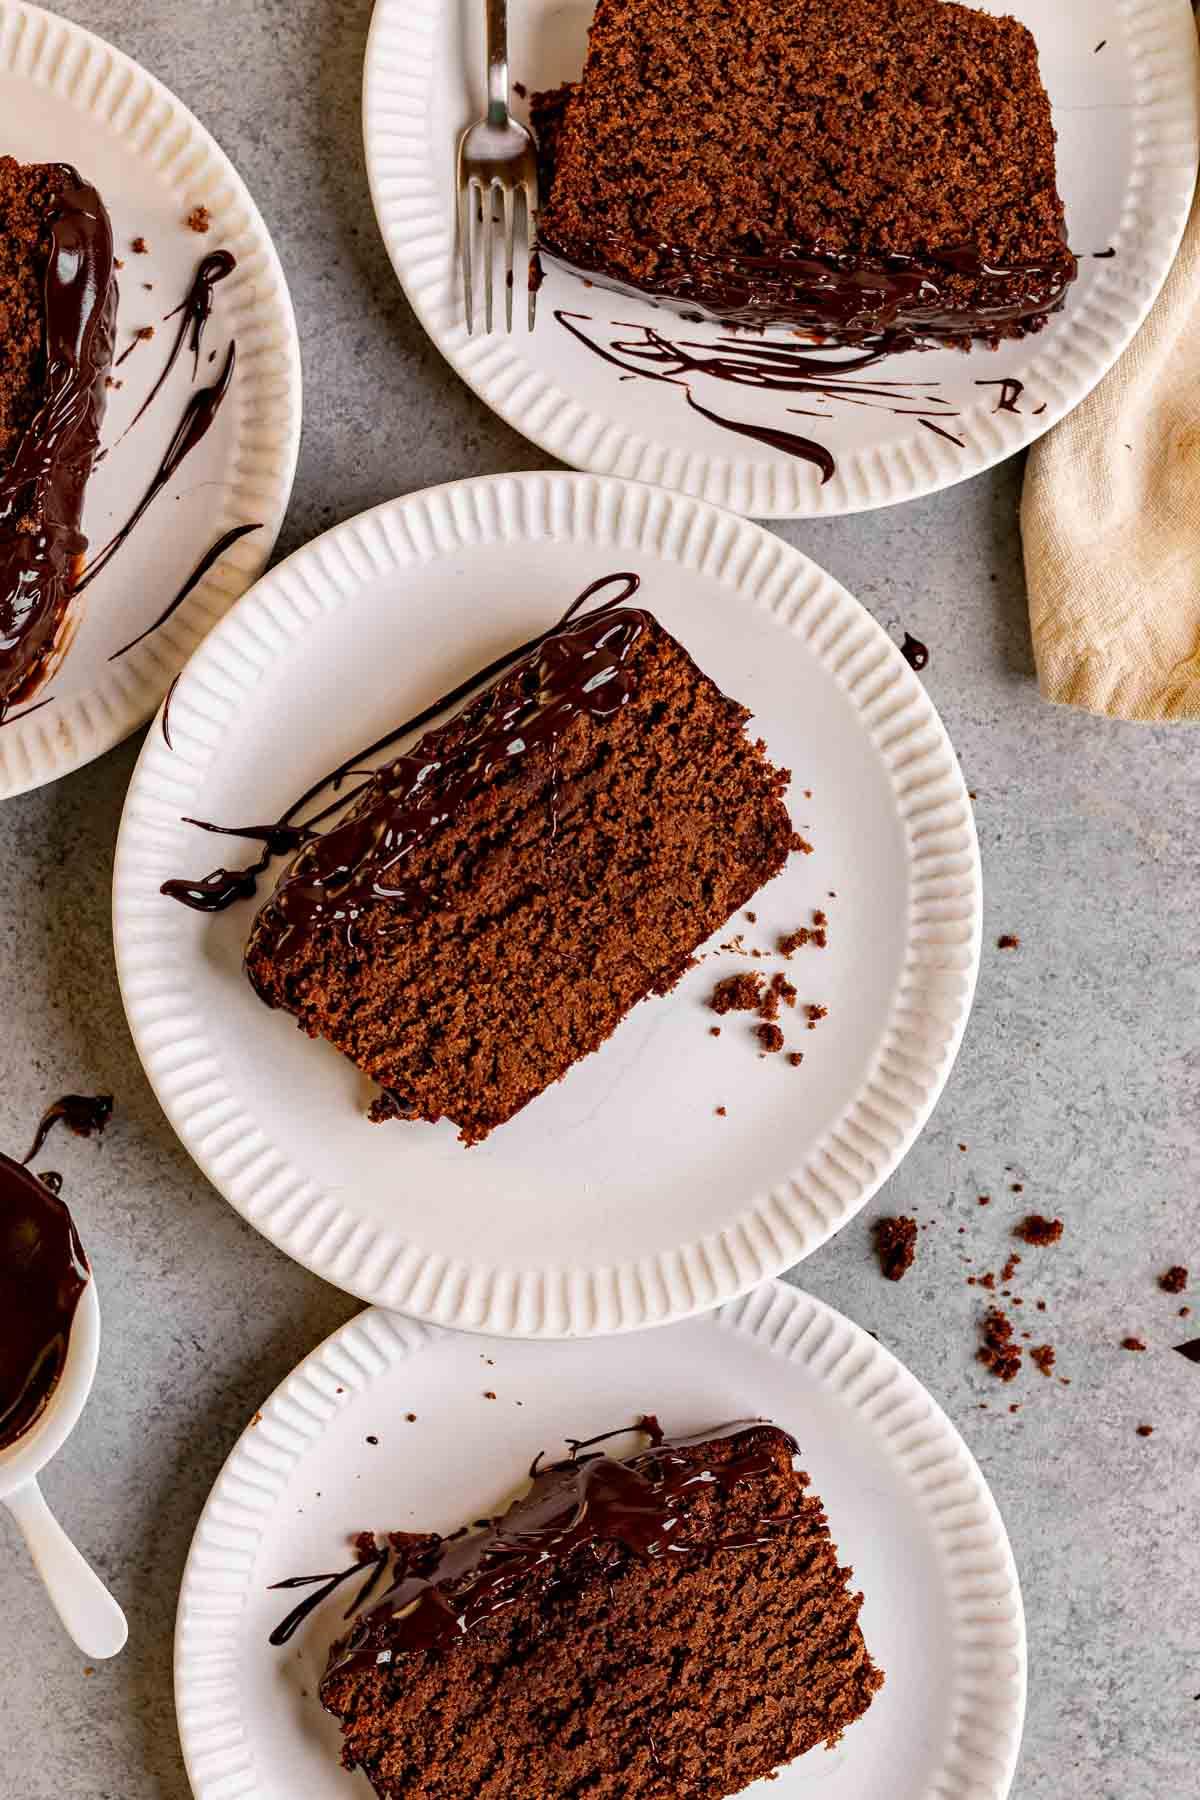 Chocolate Pound Cake slice on plate